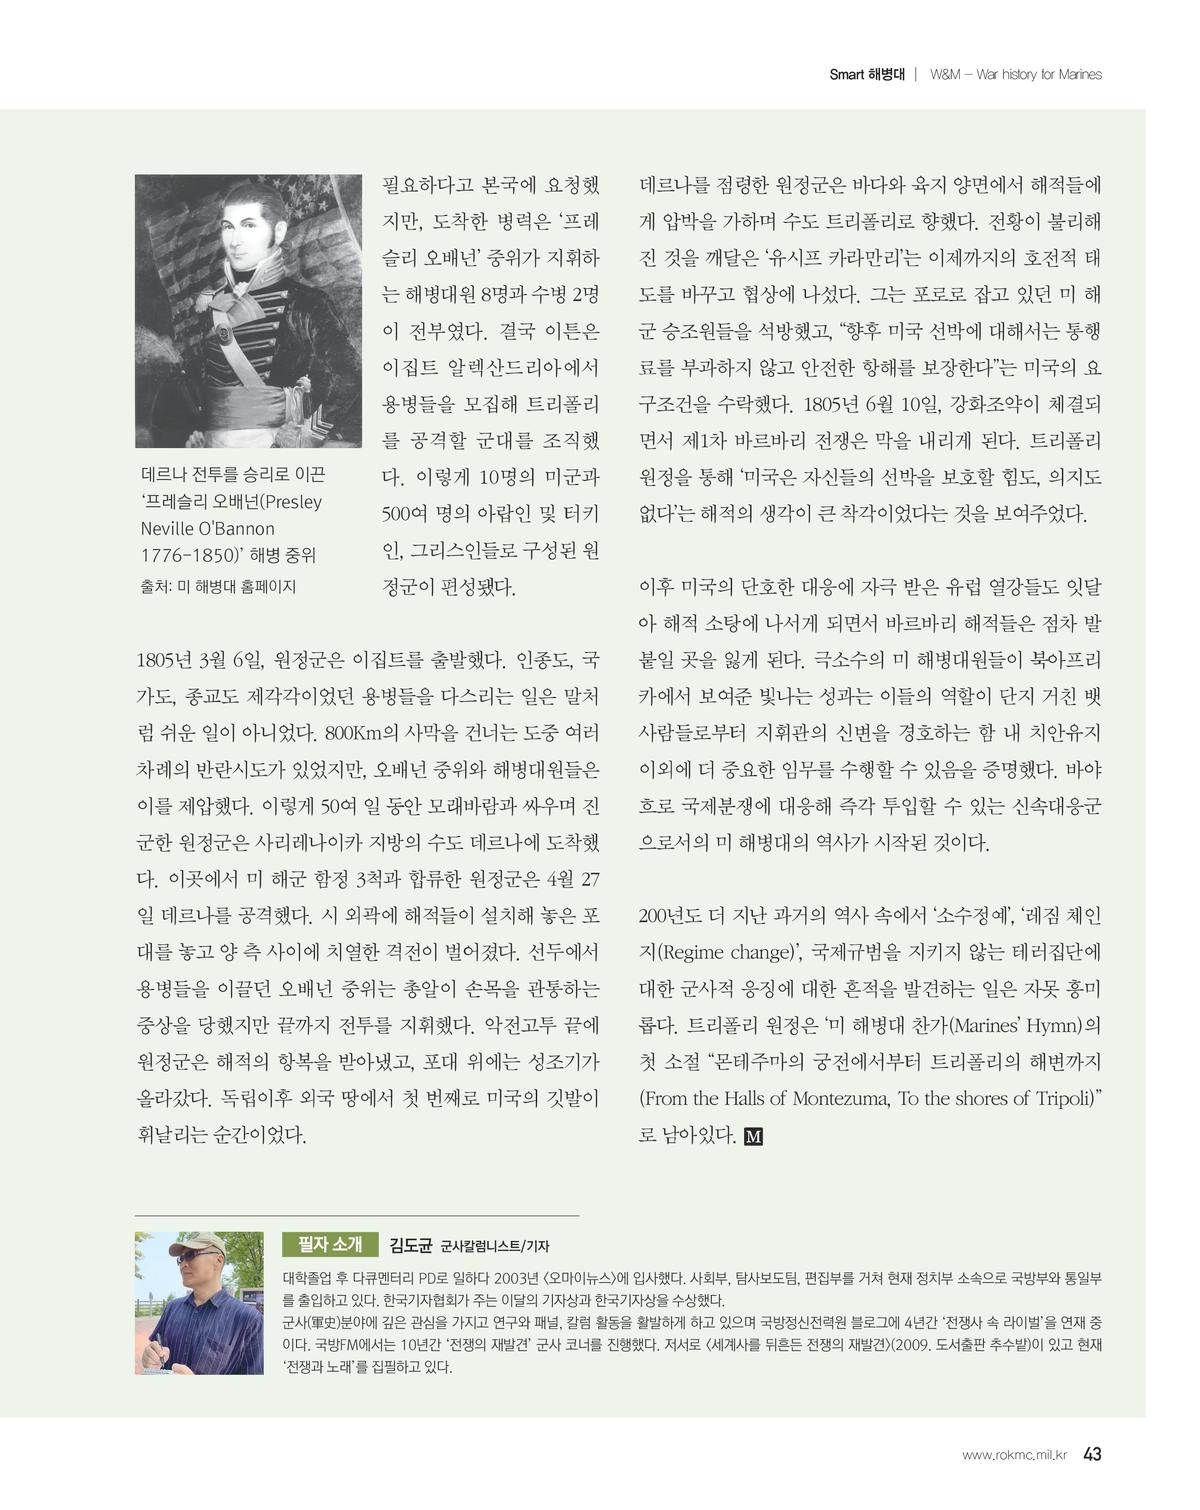 page-0515500000-45.jpg